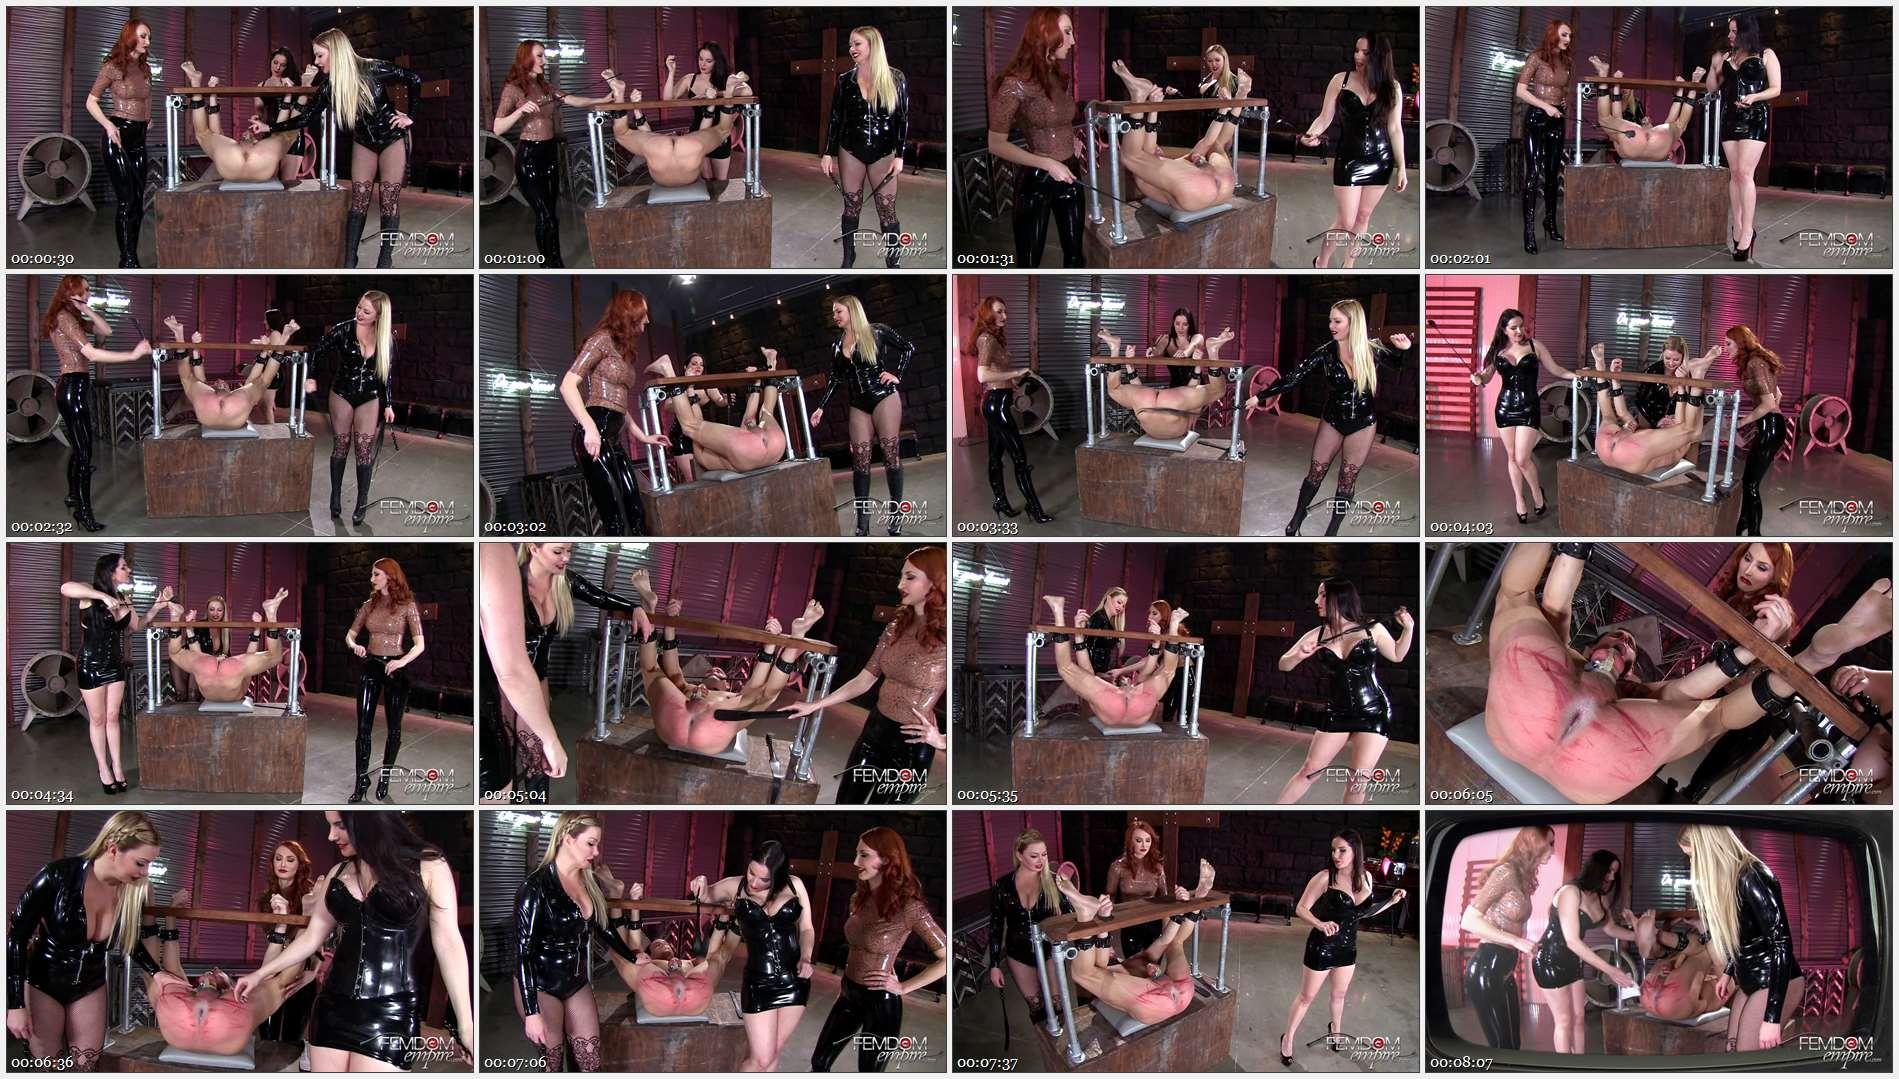 Alexandra Snow – Kendra James – Lexi Sindel – Spread Wide and Beaten Red